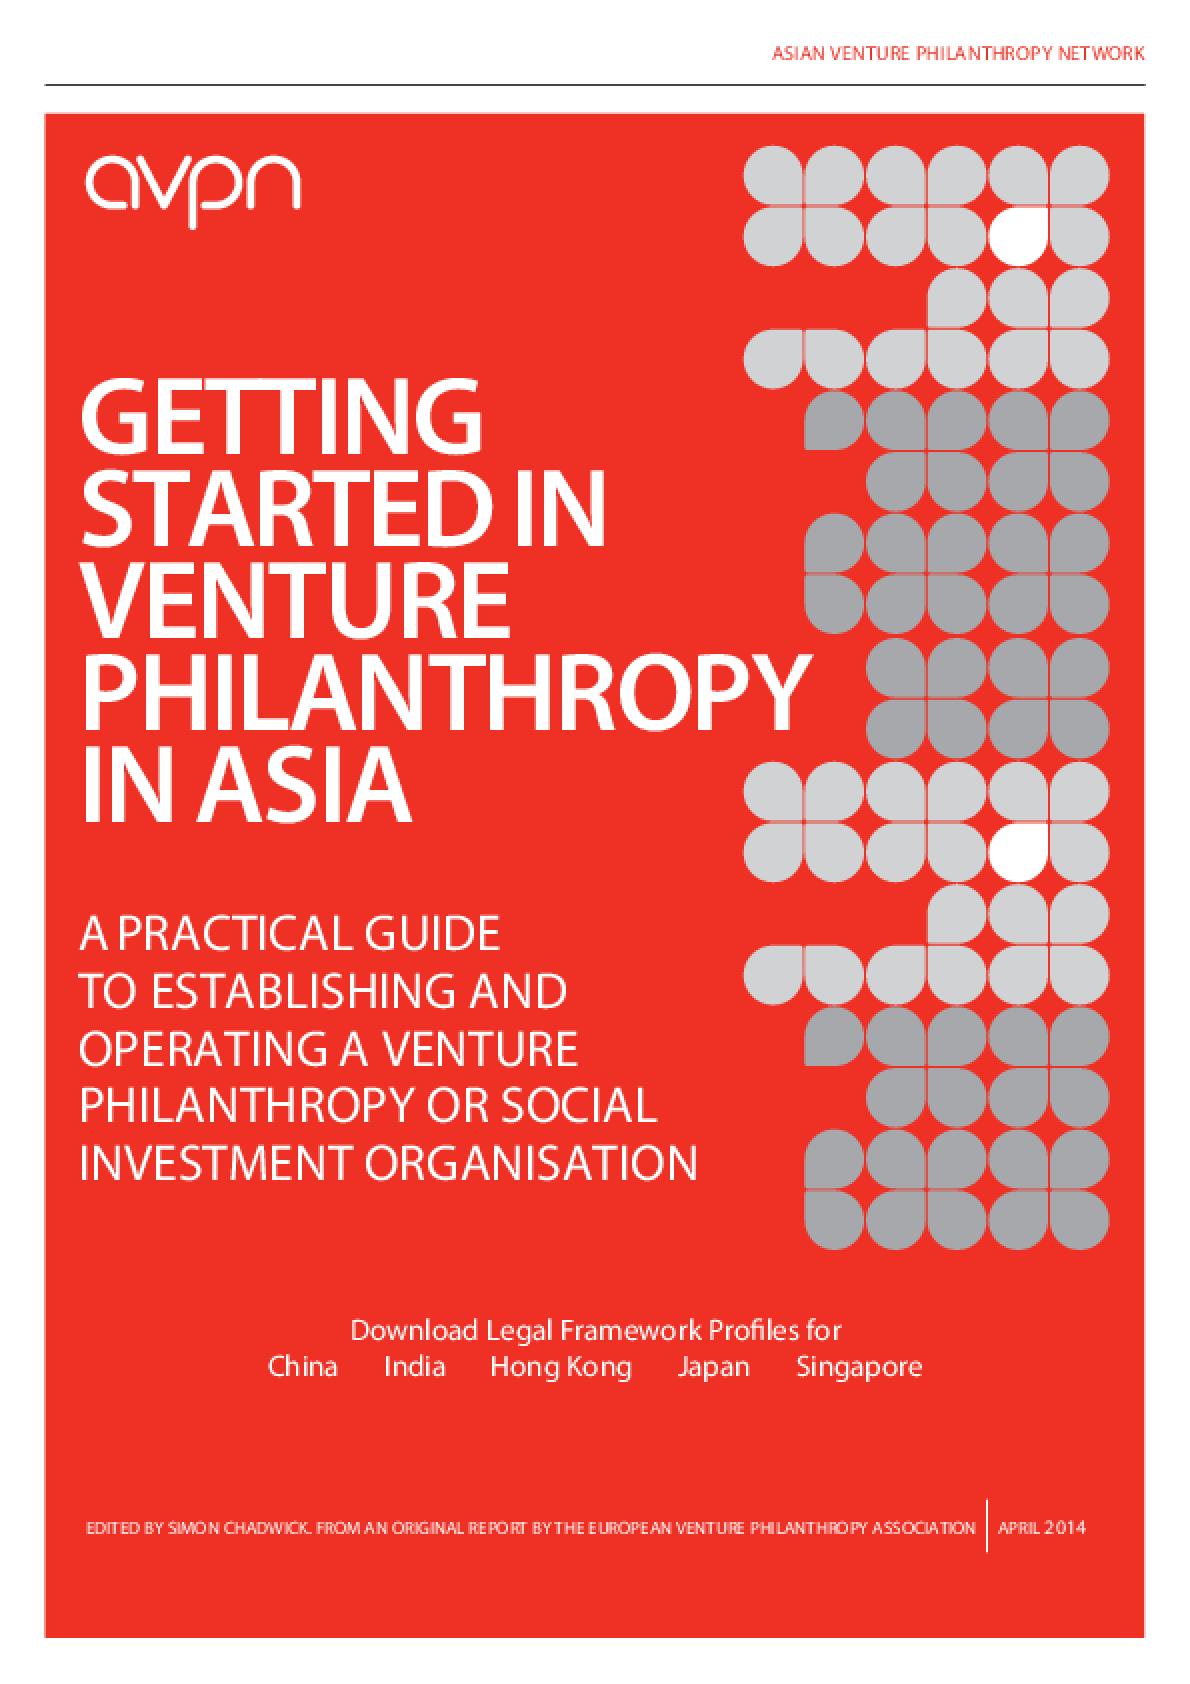 Getting Started In Venture Philanthropy In Asia